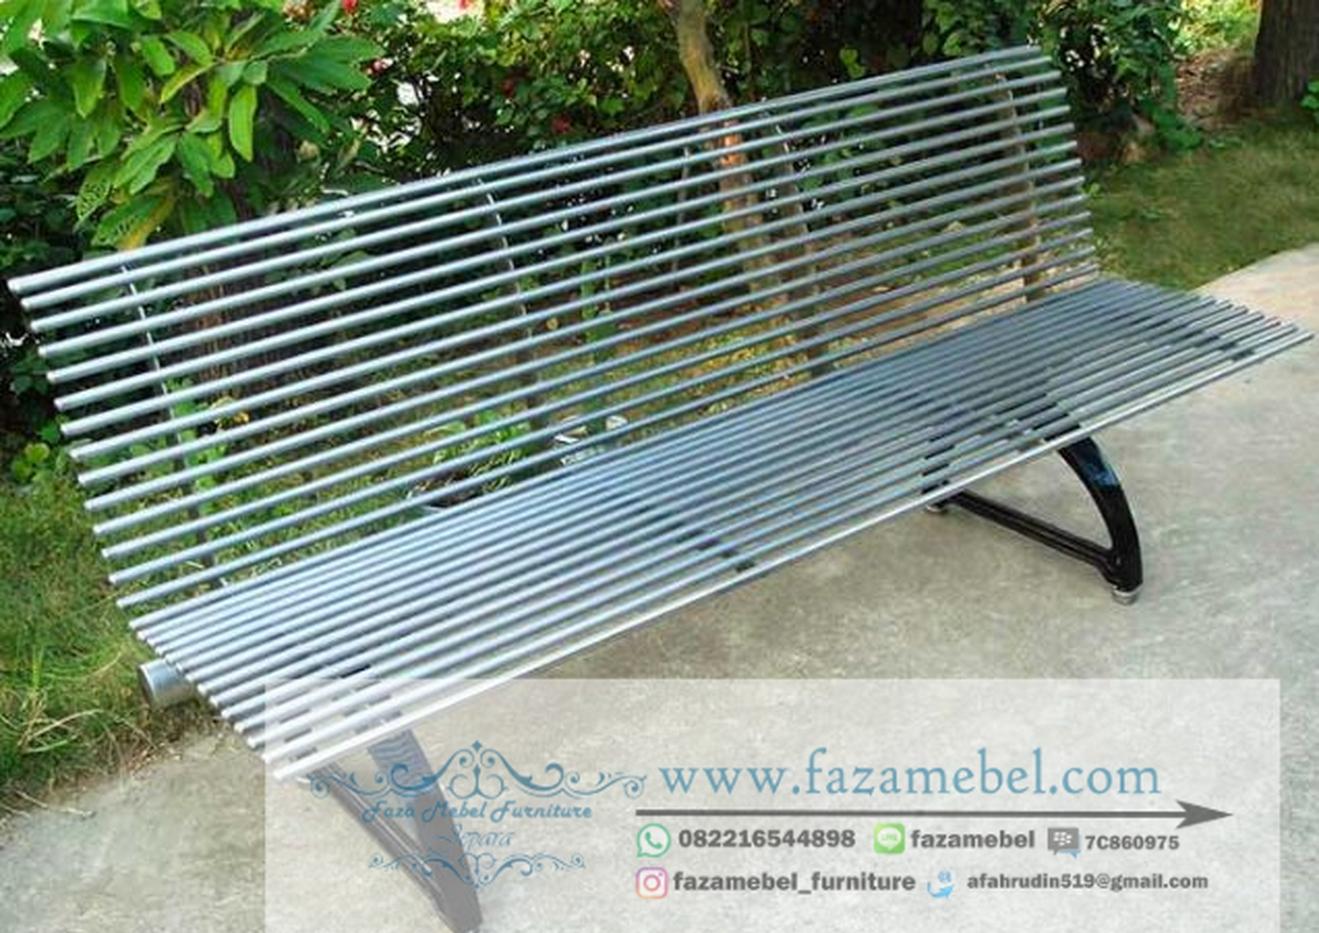 kursi-pelaminan-dari-besi (6)